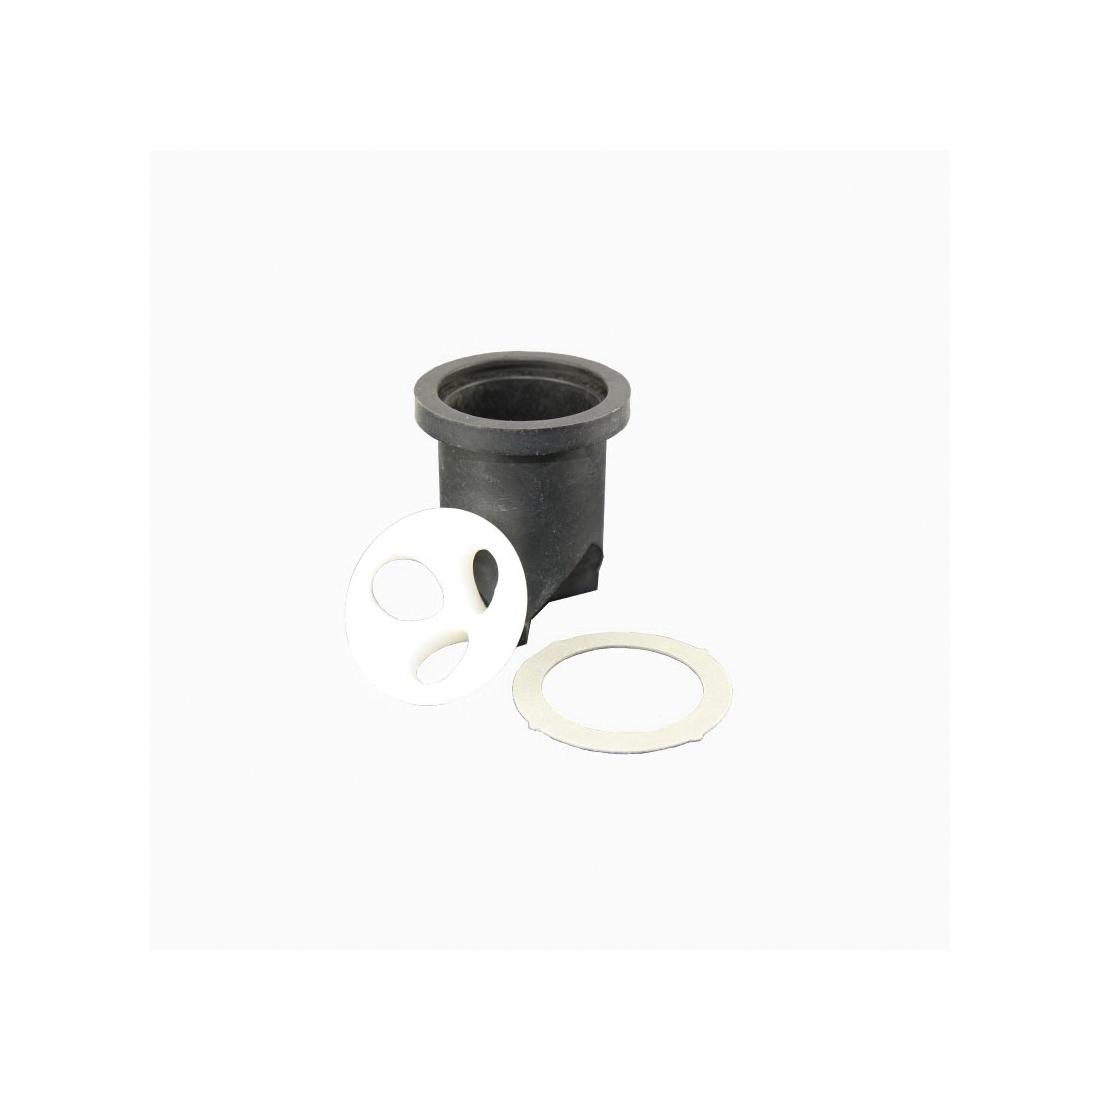 Sloan® 3323192 V-551-A Vacuum Breaker Repair Kit, For Use With Sloan® Flushometer/Urinal Valve/Royal/Regal® Flushometer and Regal® Closet, Rubber, Black, Domestic